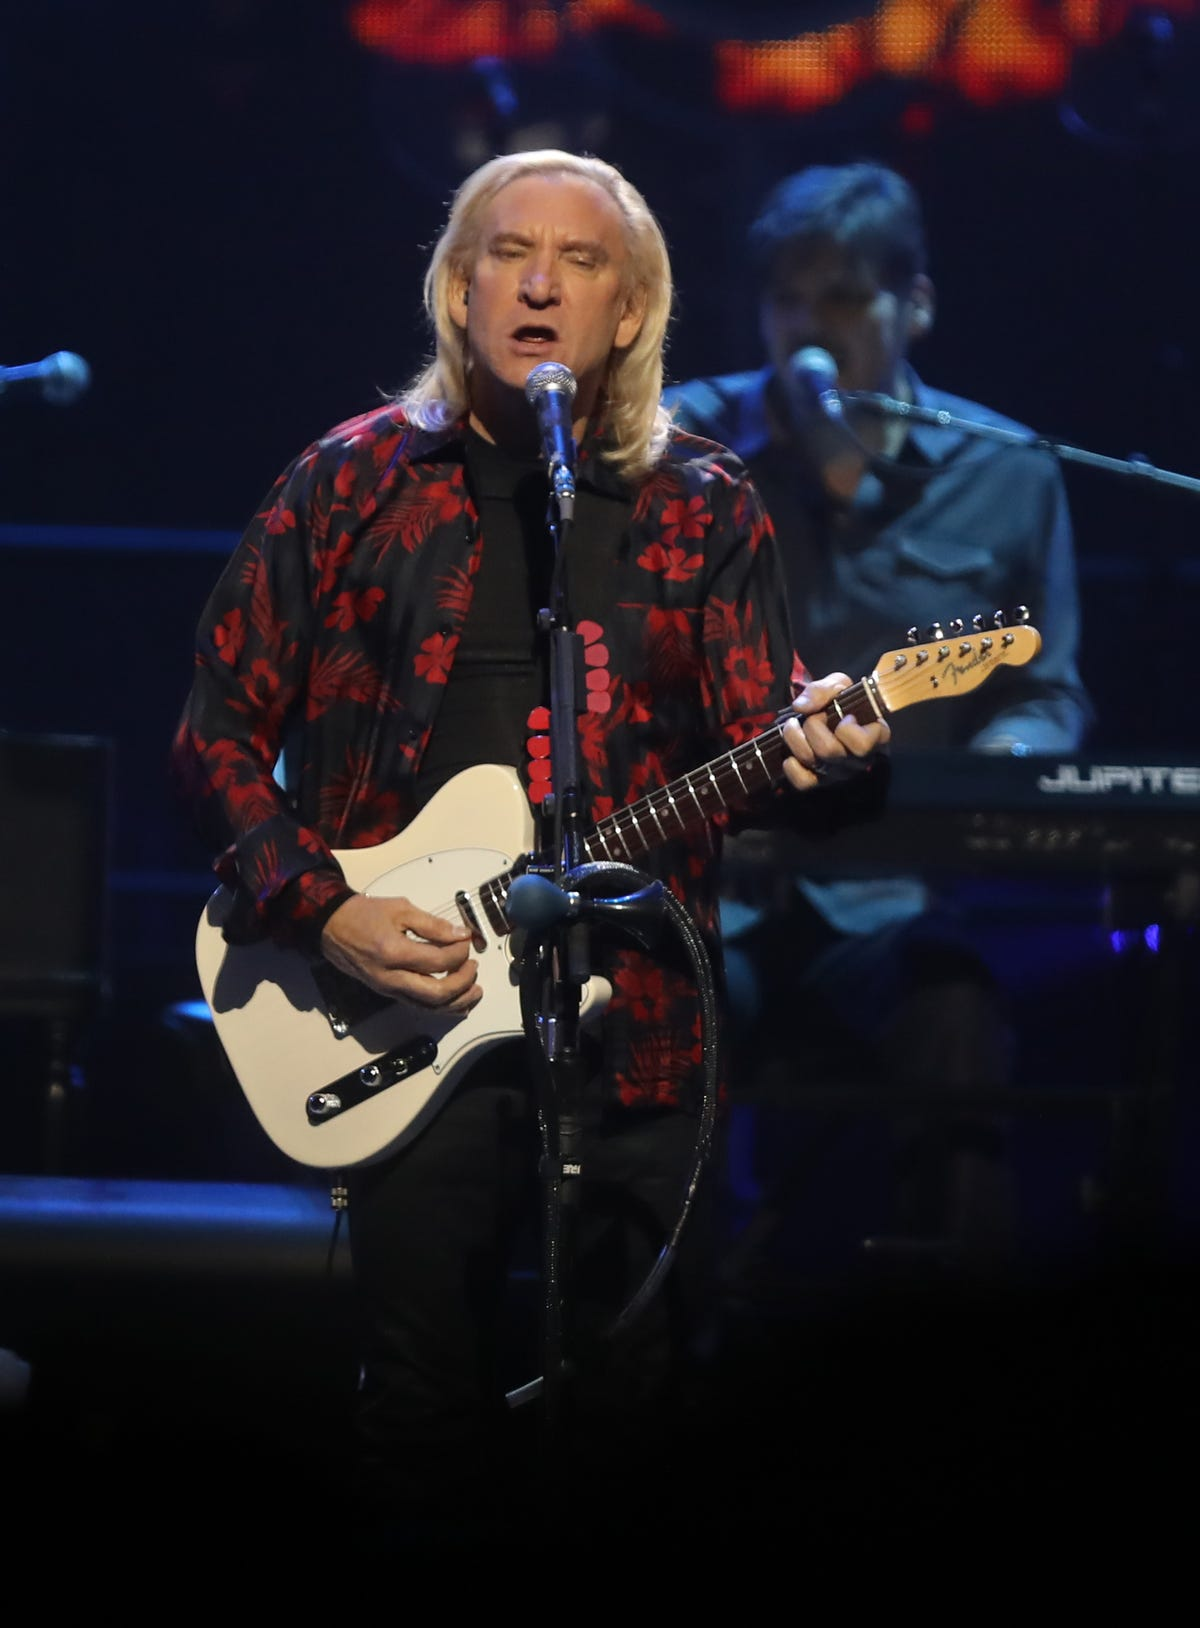 The Eagles in Nashville: Classic hits at Bridgestone Arena